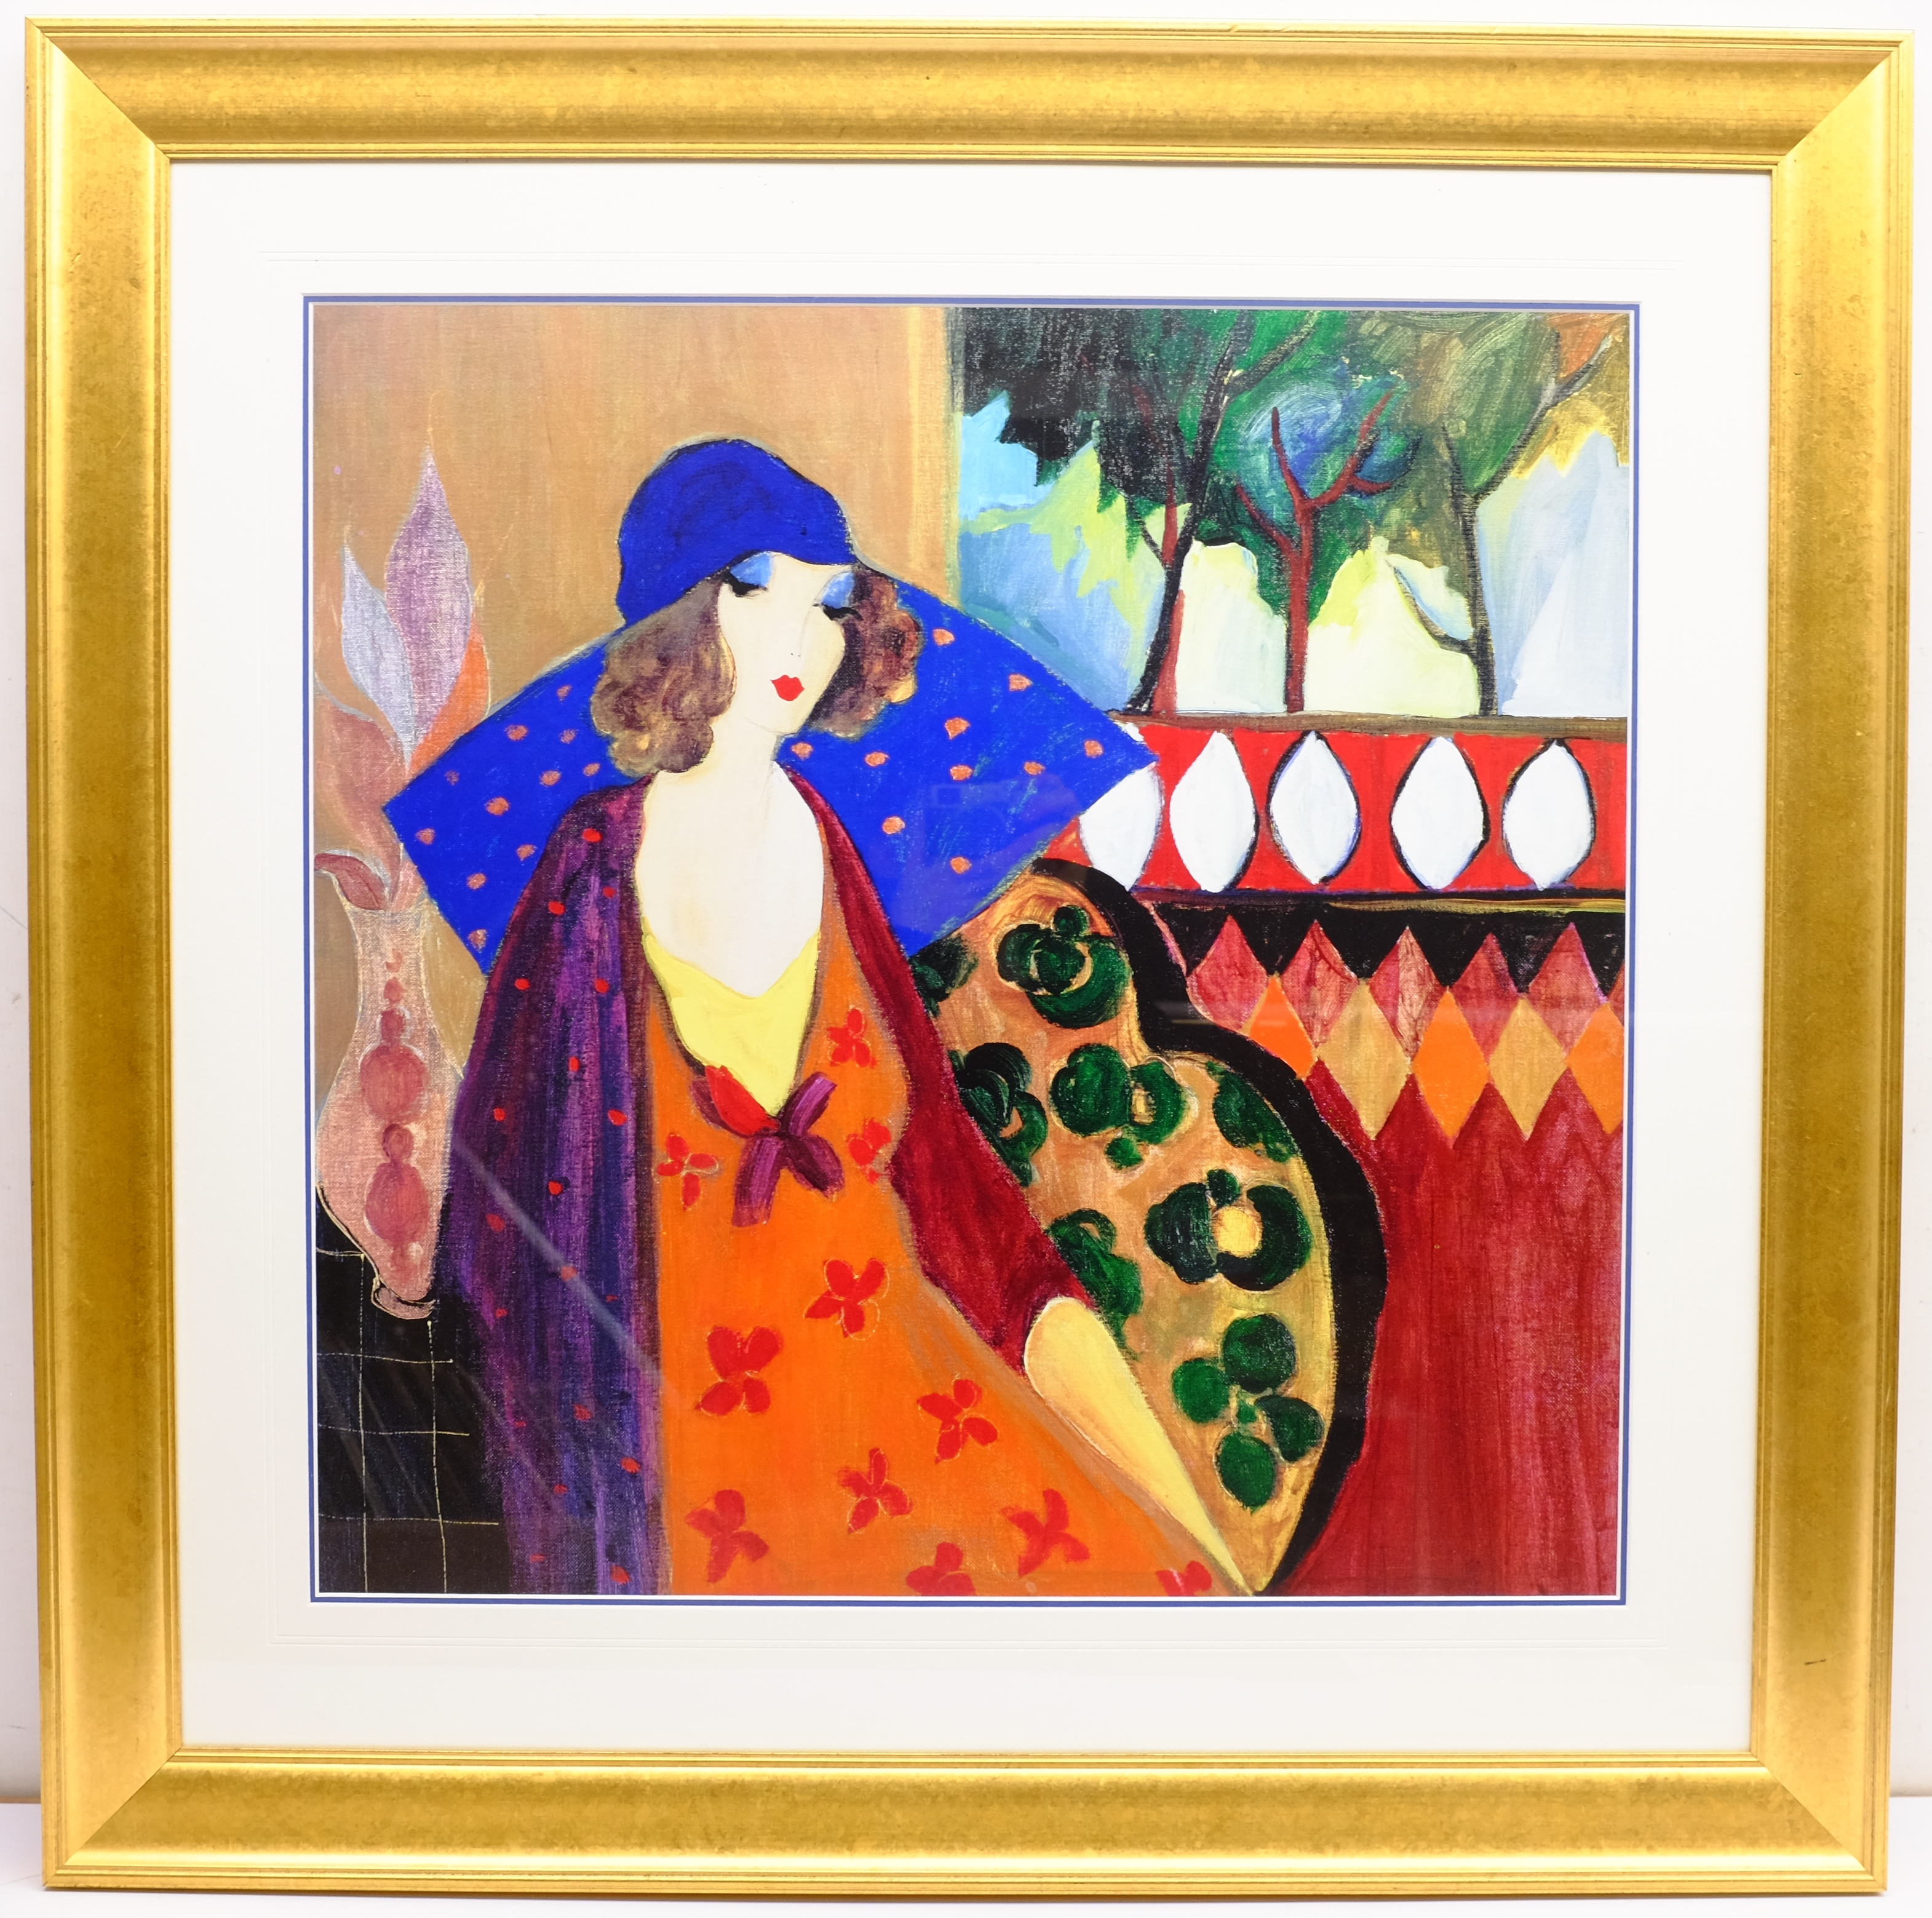 After Itzchak Tarkay (Israeli 1935-2012): 'Indigo Chapeau', colour print 63cm x 64cm - Image 4 of 4